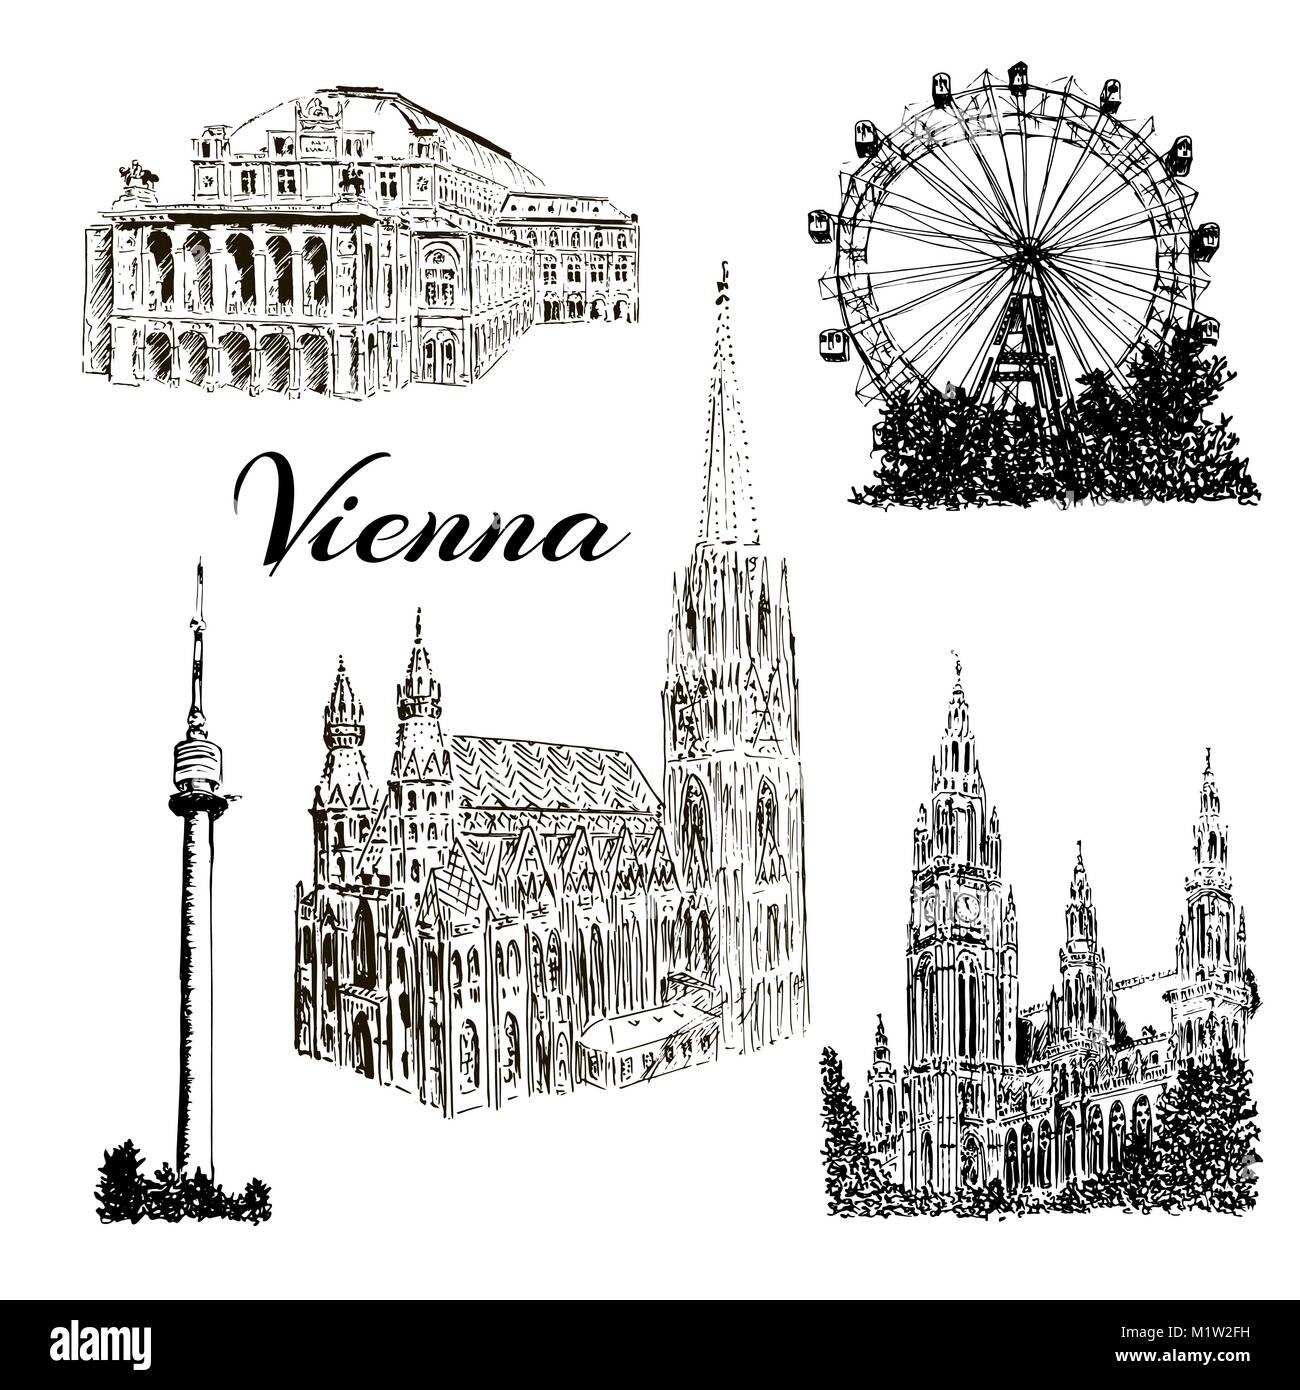 Set of Vienna symbols Vector hand drawn ink pen sketch illustration. Donauturm, Stephansdom, Rathaus, Prater - Stock Vector